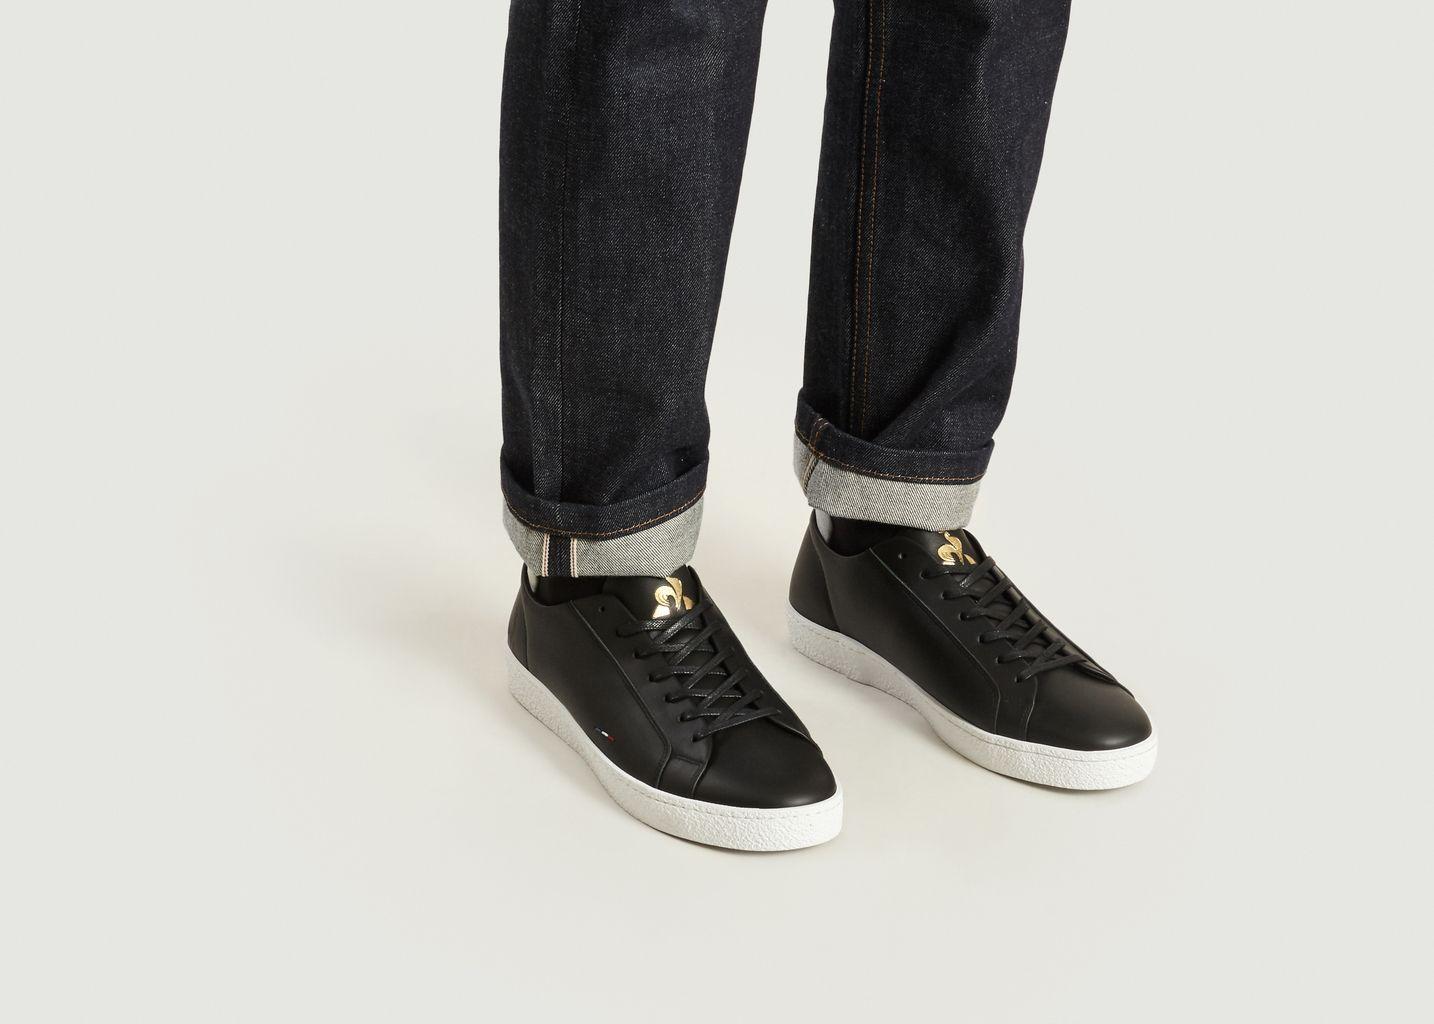 D'or Coq SportifL'exception Club Sneakers Noir Le 0nOkXNwZ8P